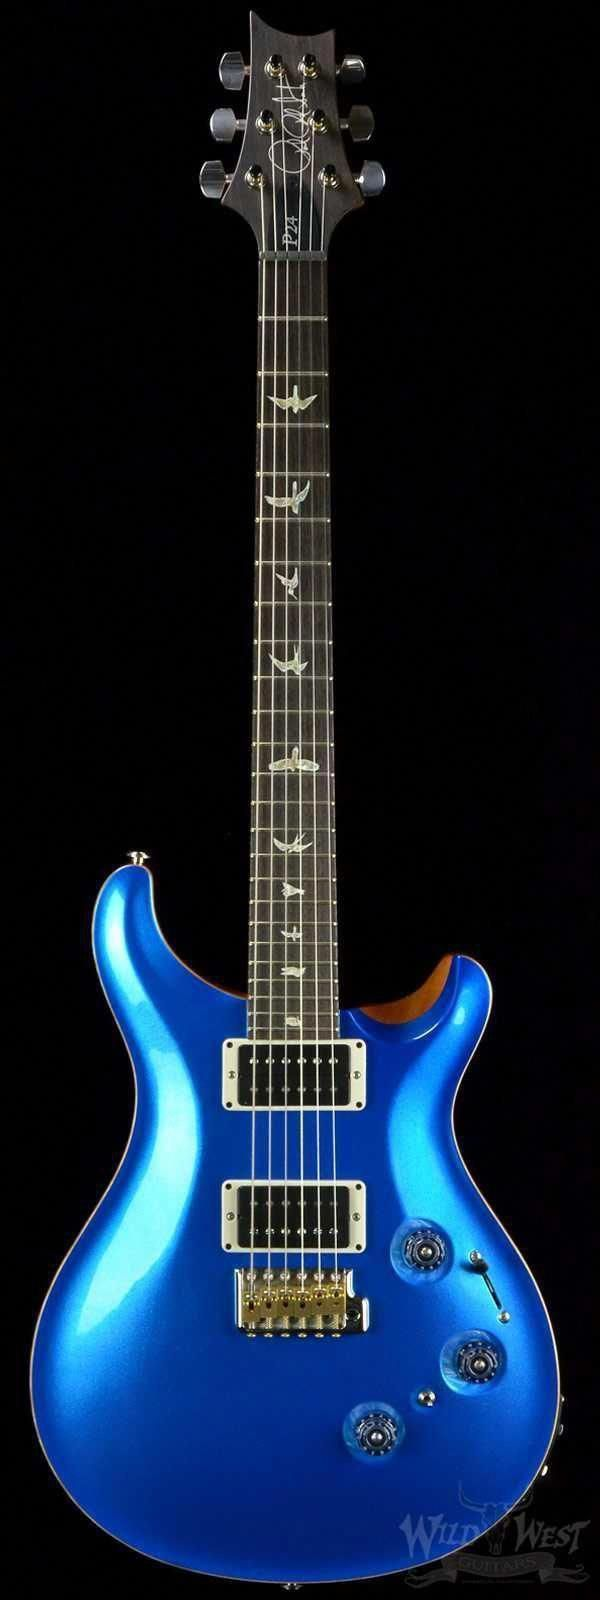 PRS Guitar Piezo PRS Guitar Cleaner #guitargod #guitarlesson #PRSGuitars #prsguitar PRS Guitar Piezo PRS Guitar Cleaner #guitargod #guitarlesson #PRSGuitars #prsguitar PRS Guitar Piezo PRS Guitar Cleaner #guitargod #guitarlesson #PRSGuitars #prsguitar PRS Guitar Piezo PRS Guitar Cleaner #guitargod #guitarlesson #PRSGuitars #prsguitar